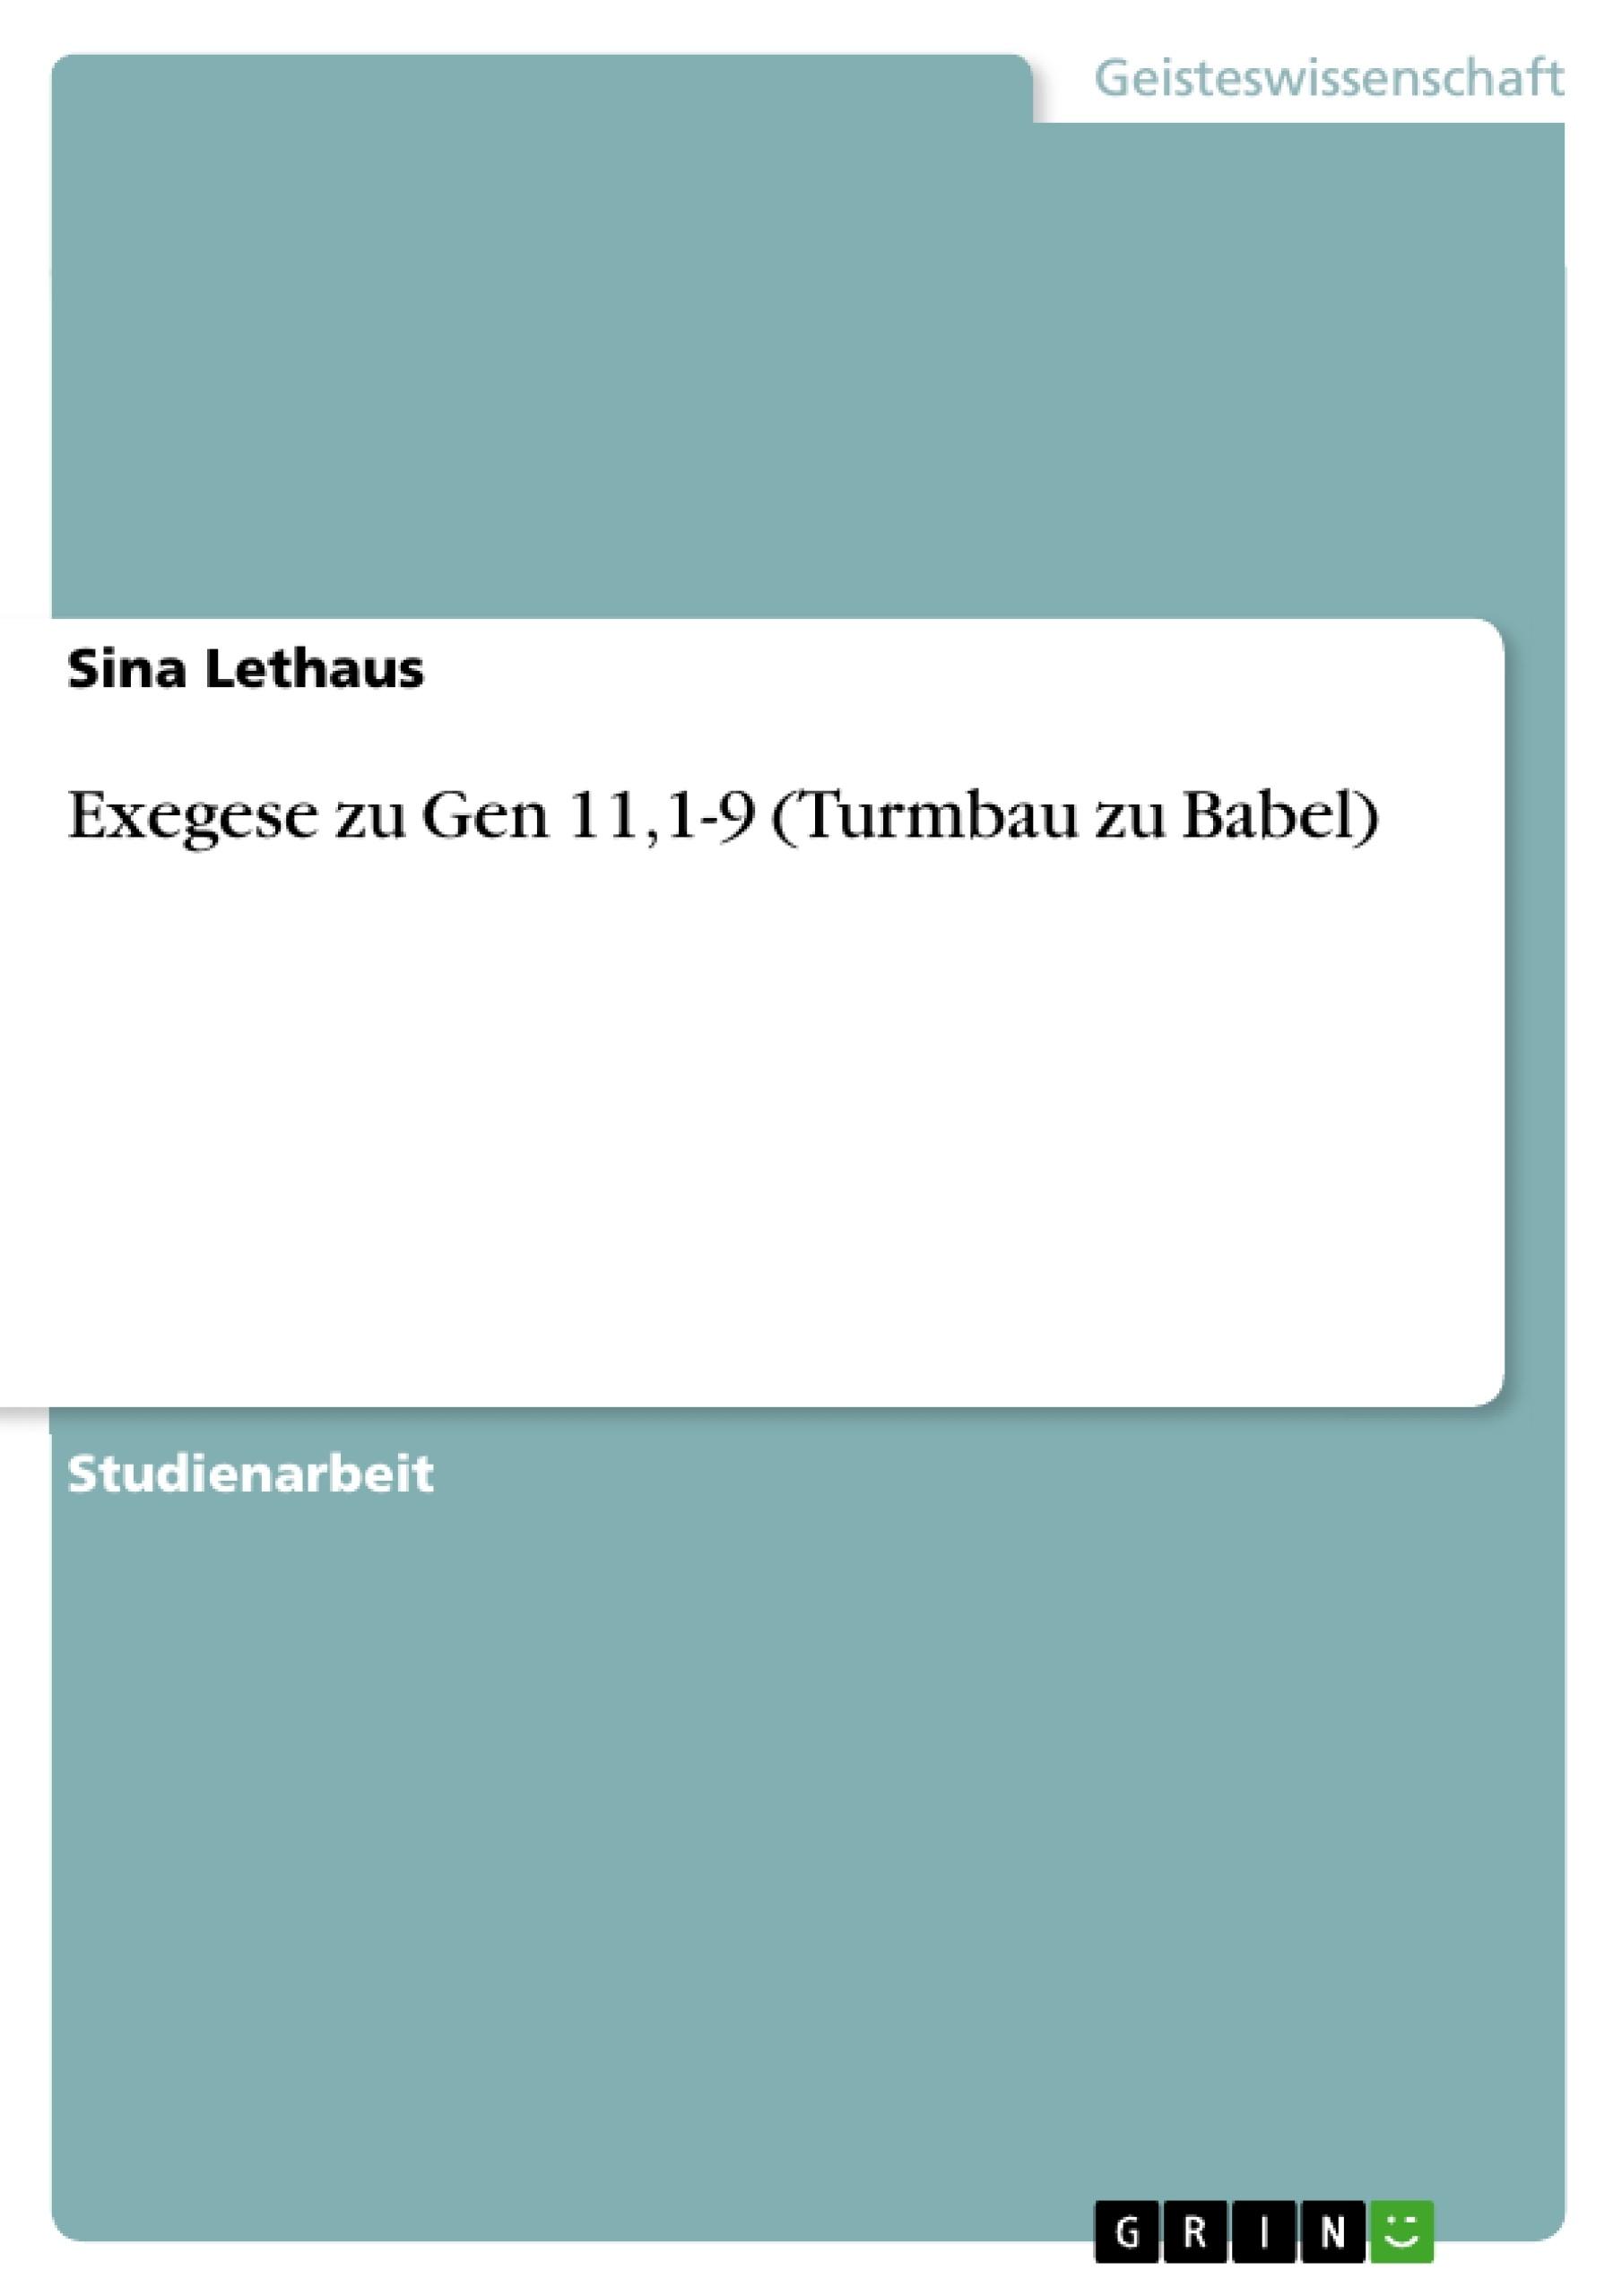 Titel: Exegese zu Gen 11,1-9 (Turmbau zu Babel)